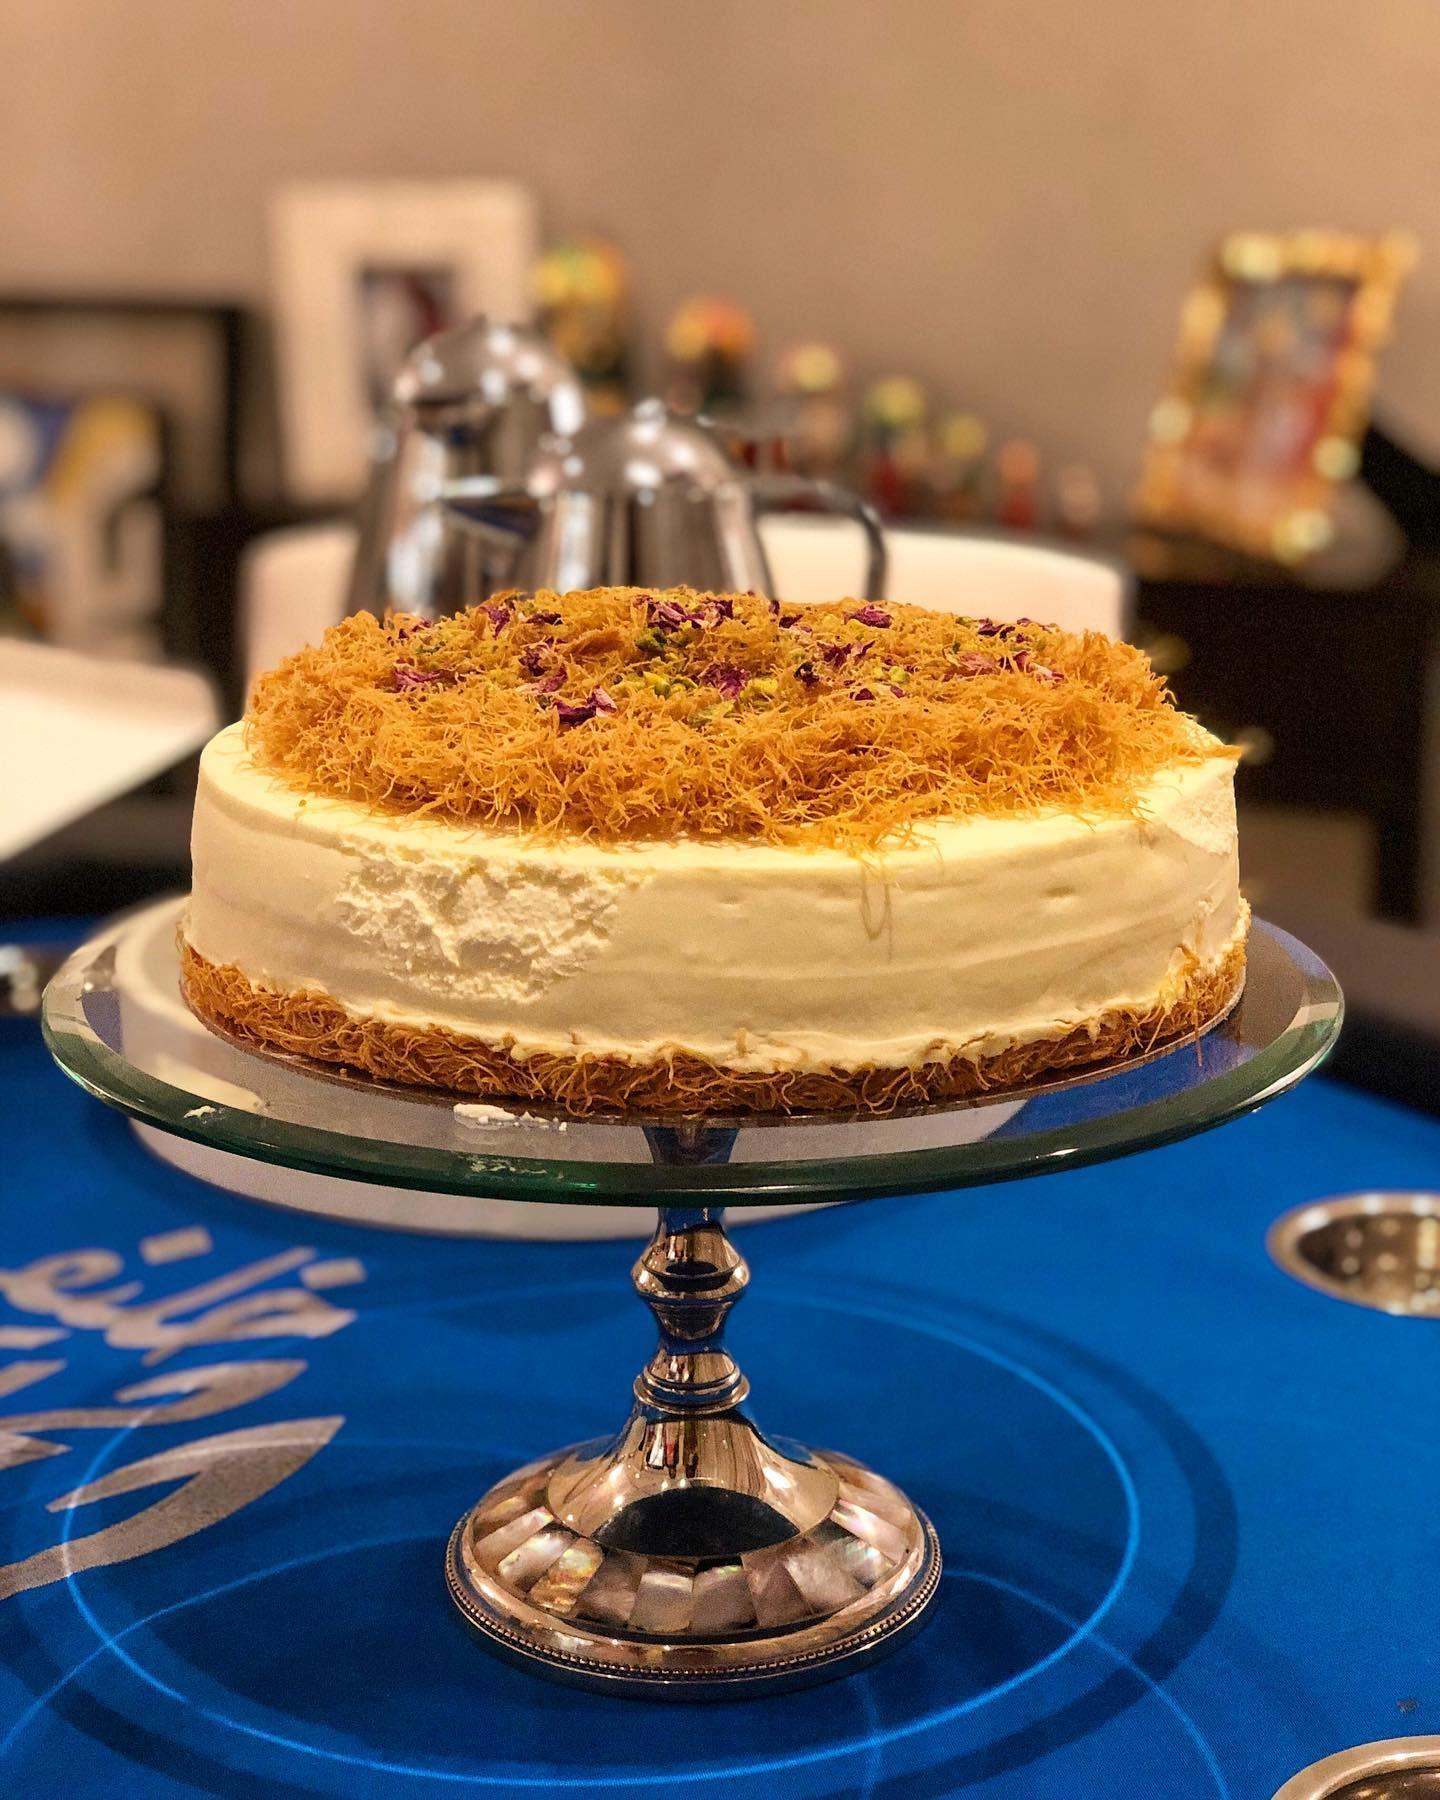 Ramadan Dessert Kunafeh Cheesecake Hausbakery Light Creamy Cheesecake Topped With Crunchy Orange Blossom Infused Vermi Ramadan Desserts Desserts Food